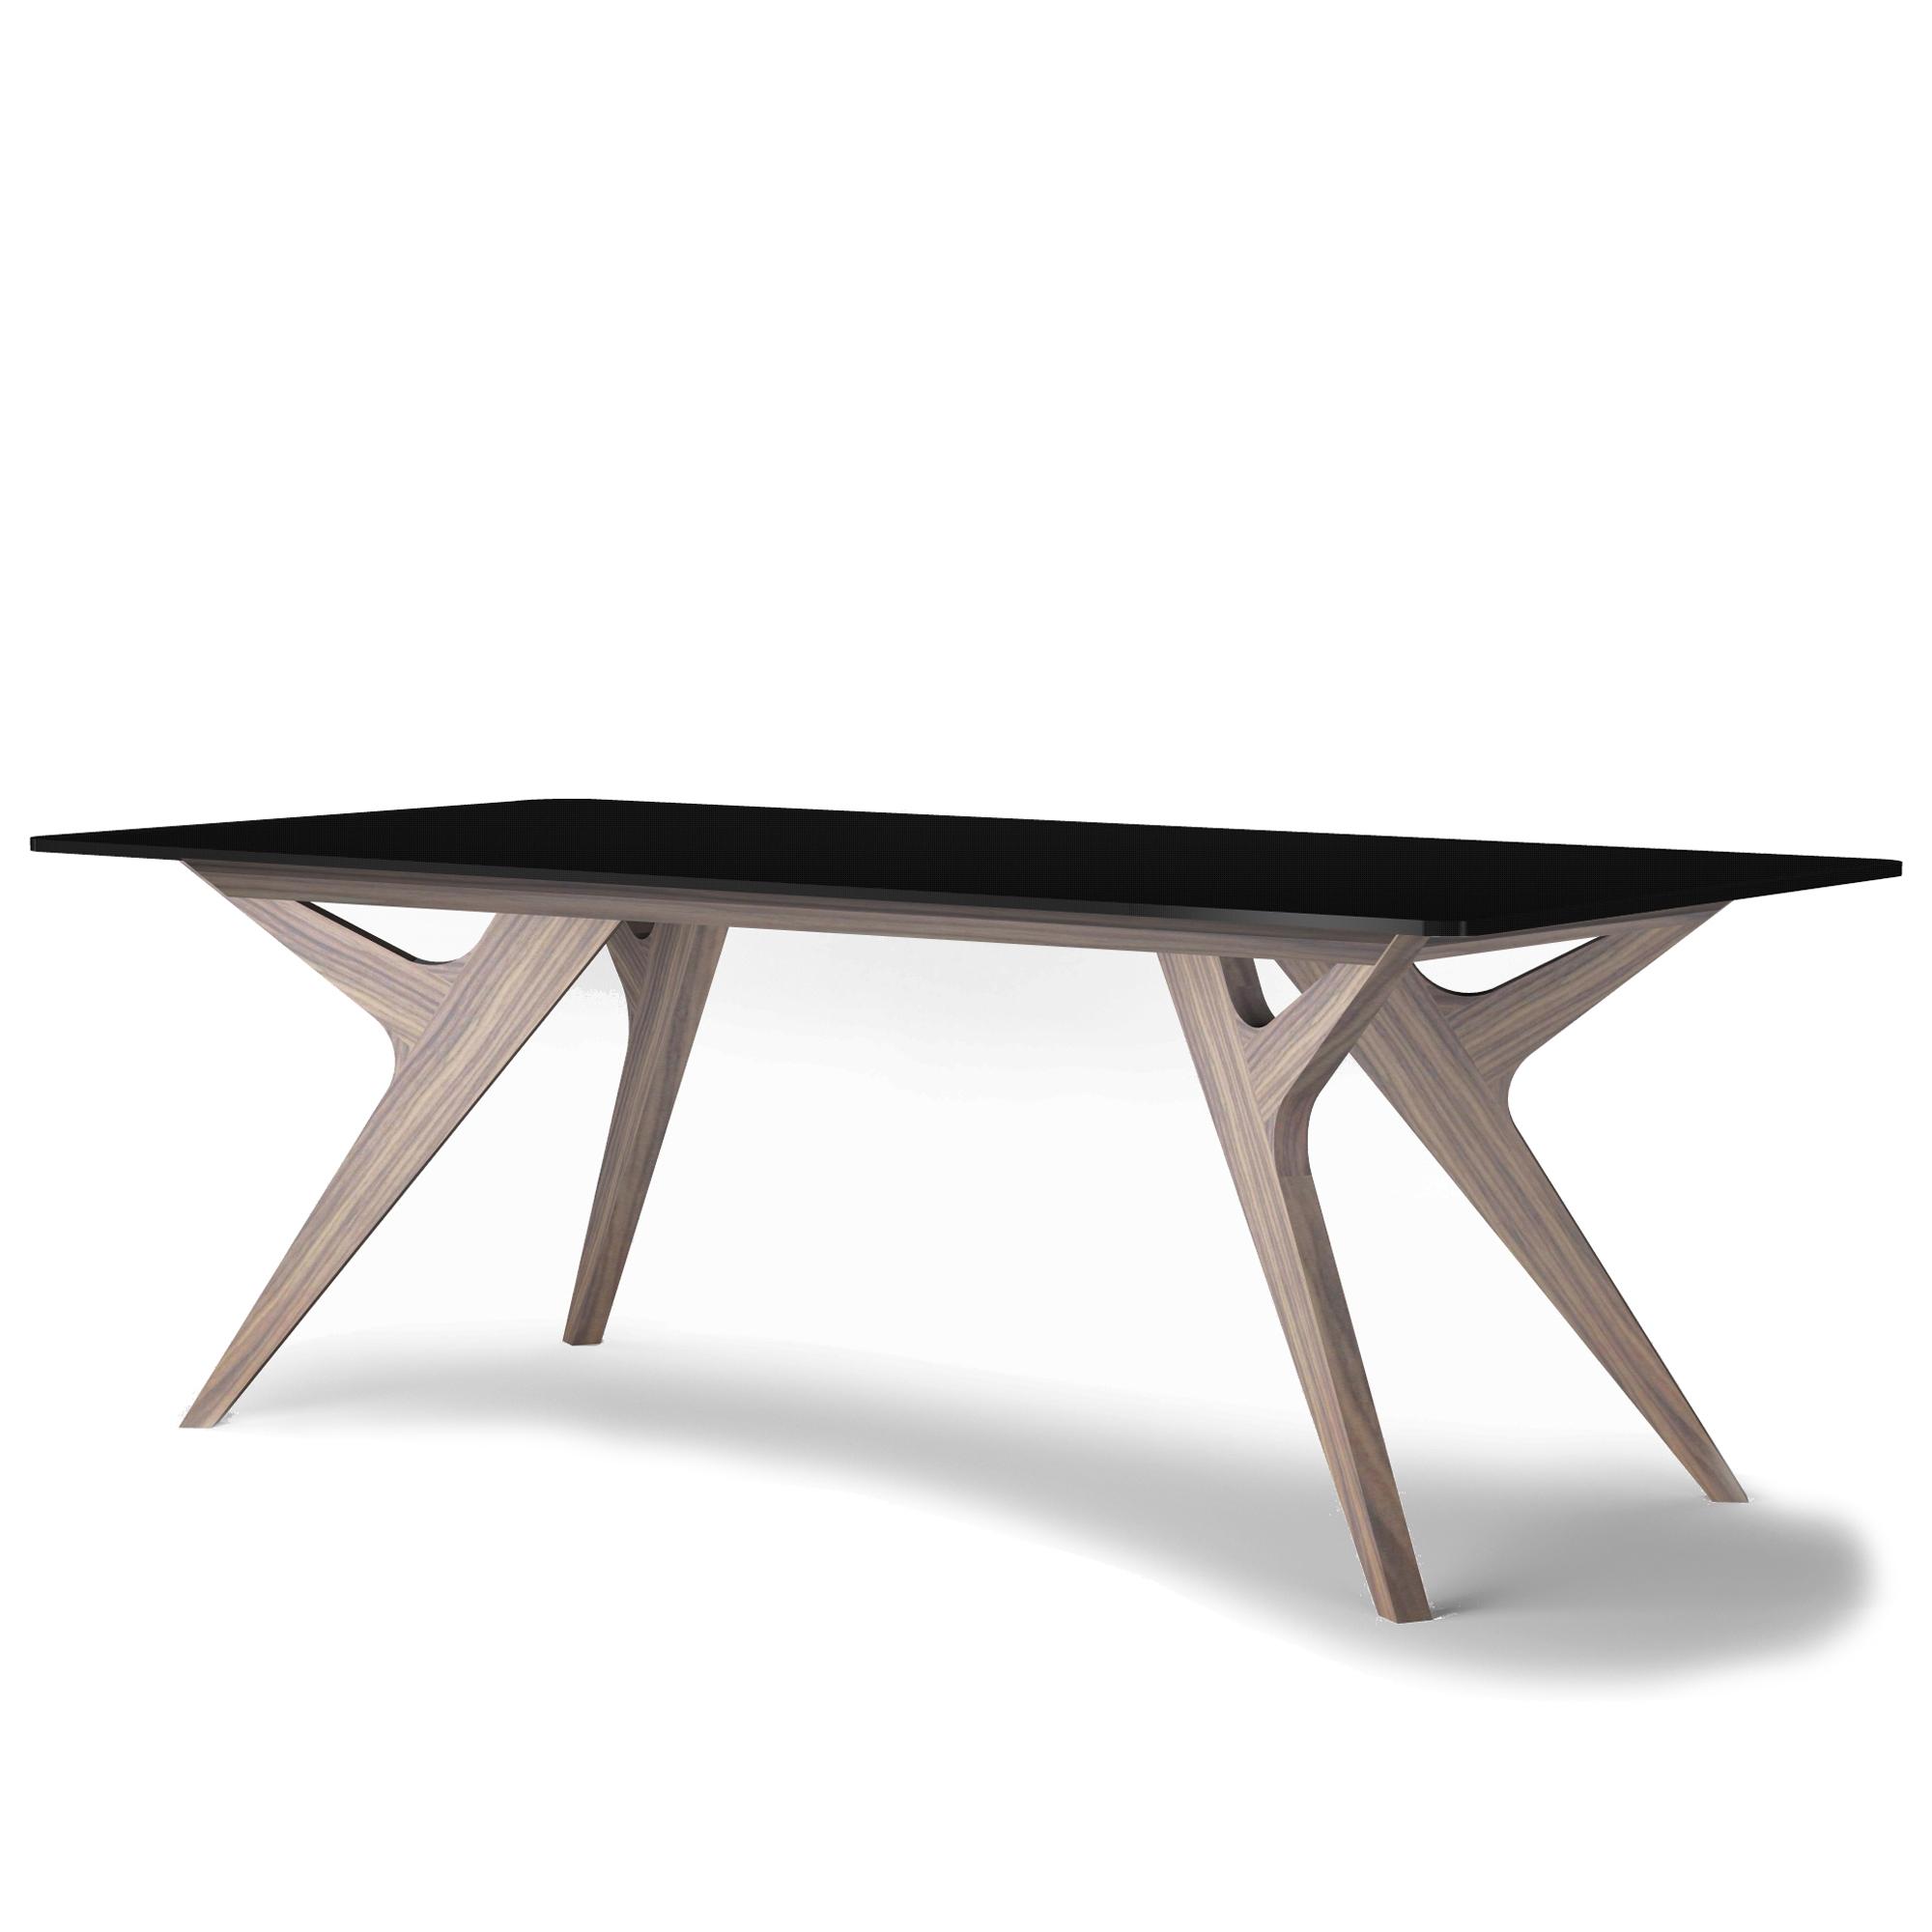 Table scandinave haut de gamme